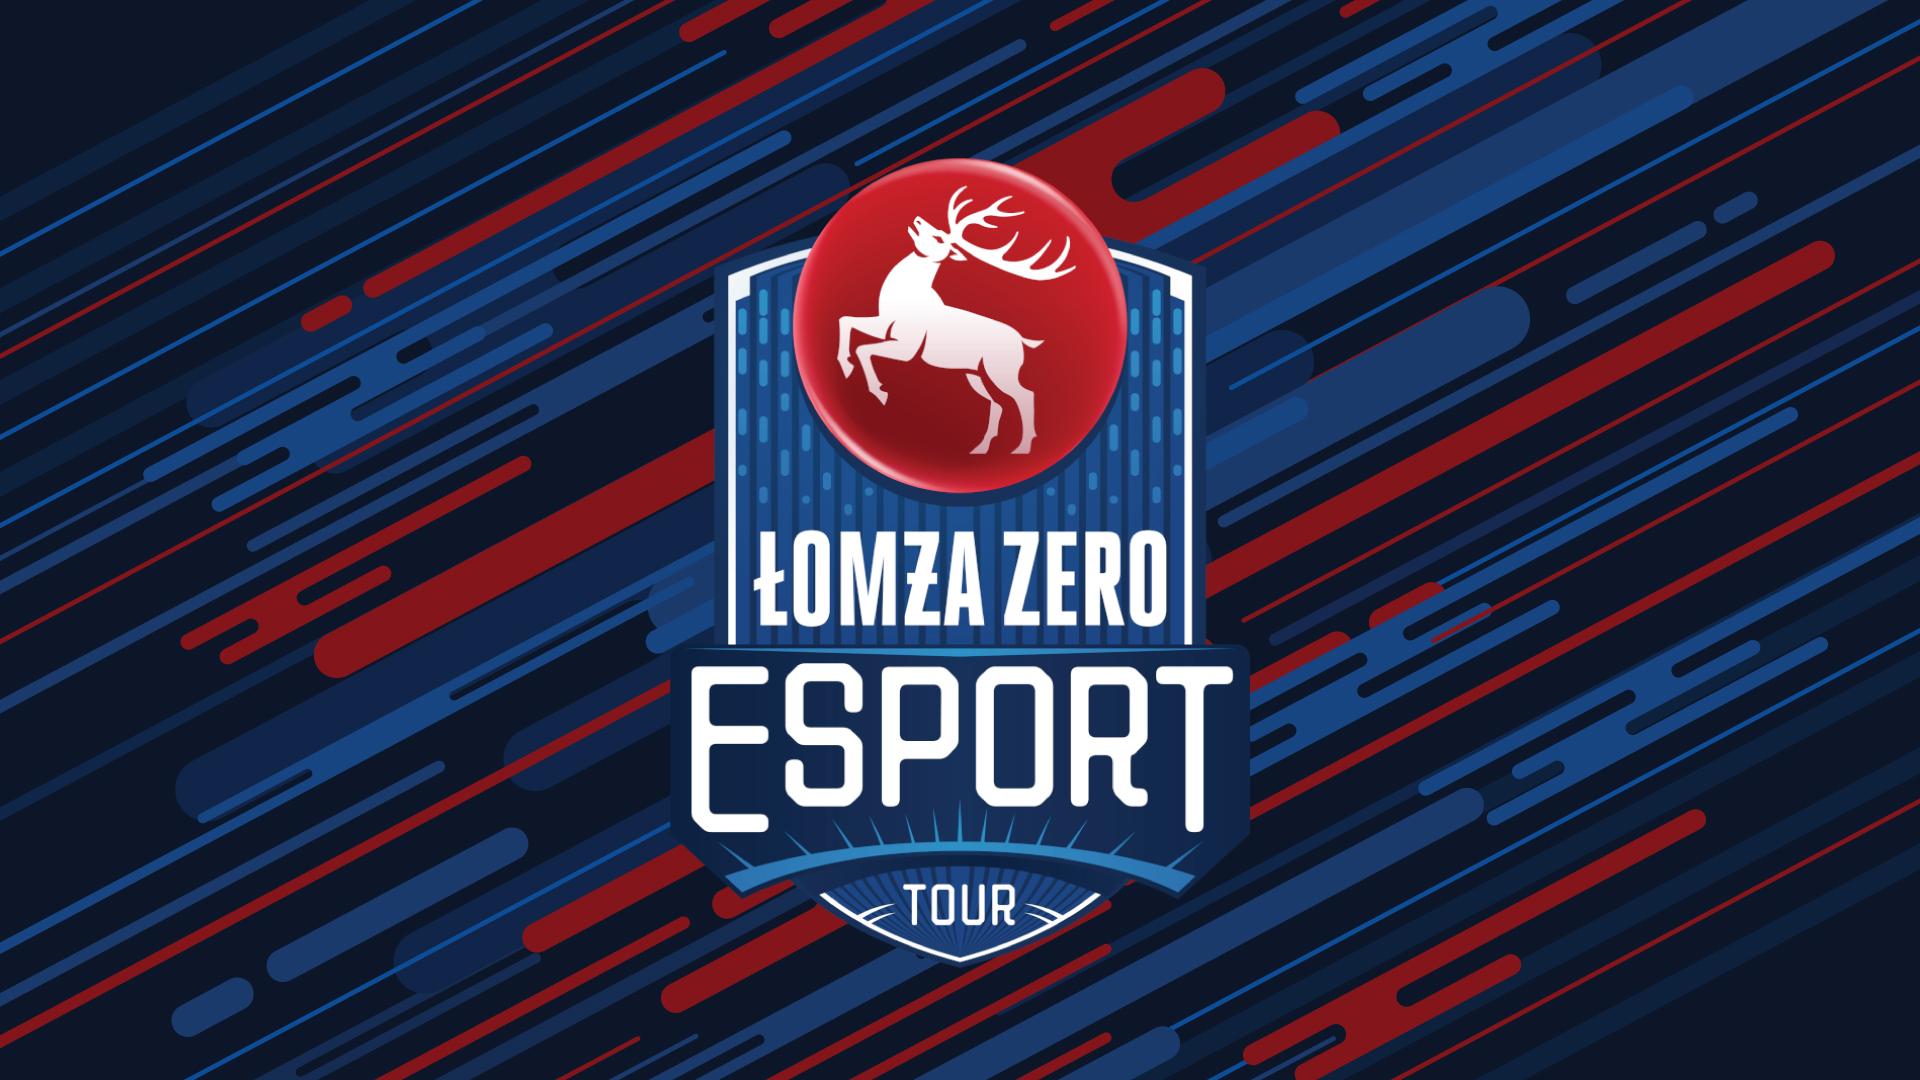 Łomża Zero Esport Tour